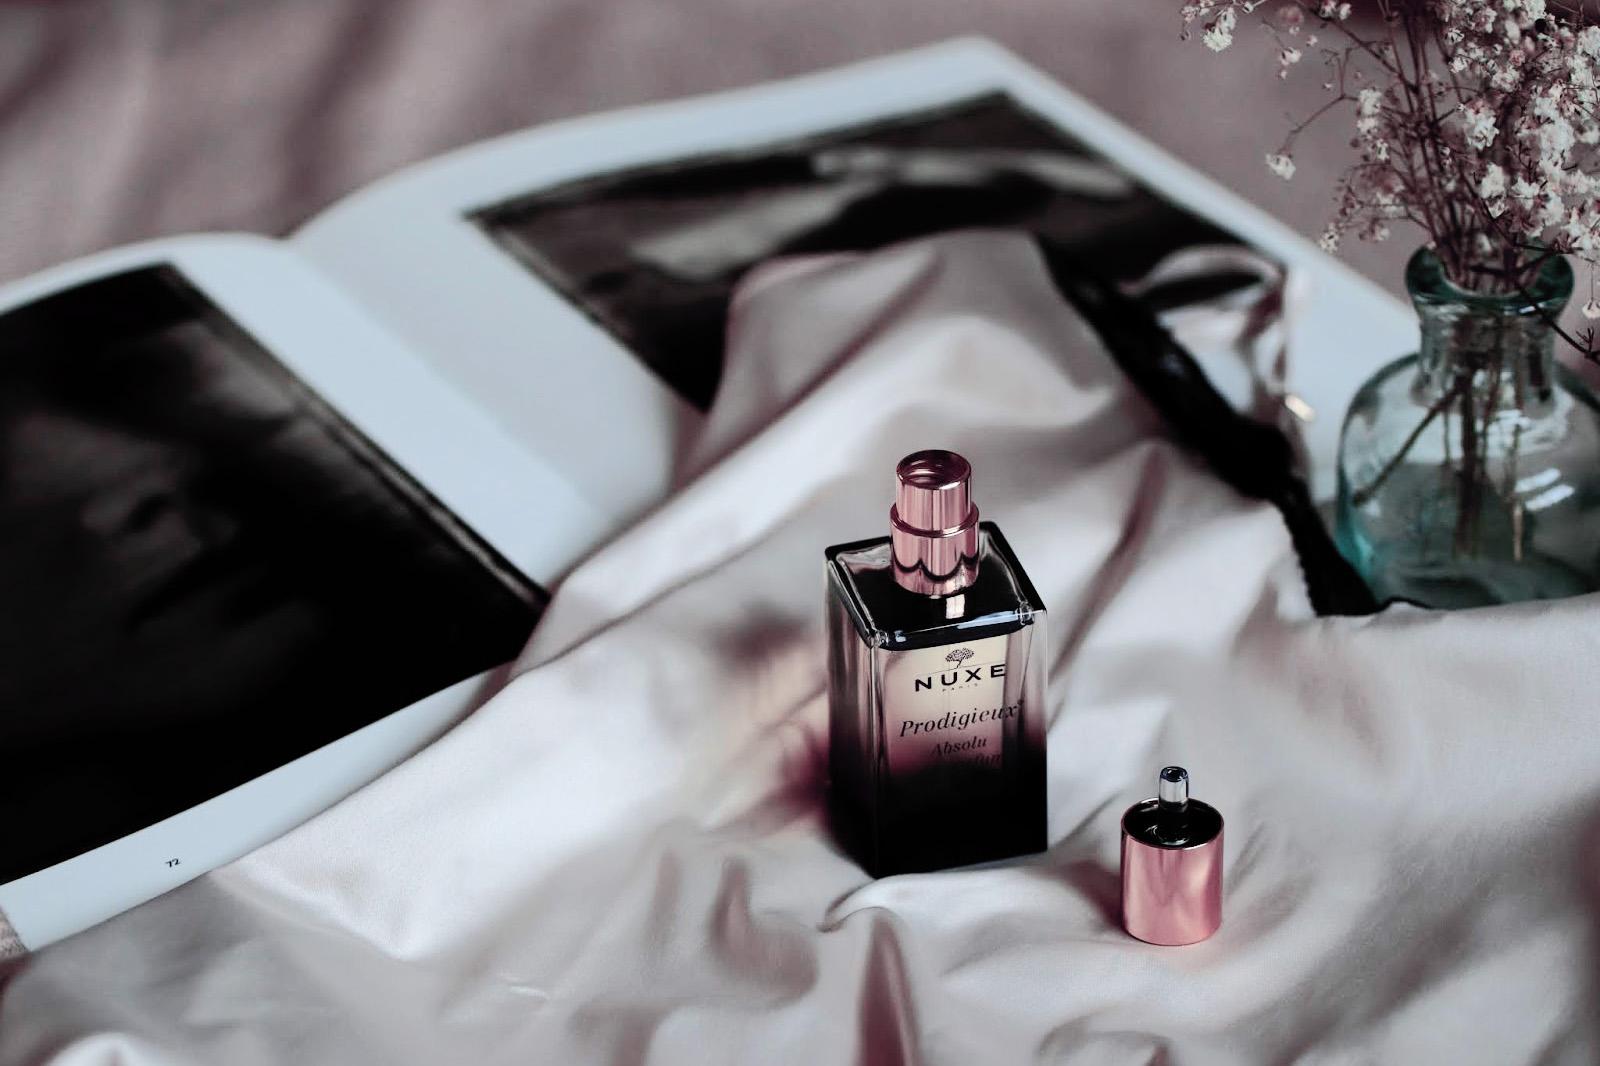 nuxe prodigieux absolu de parfum avis test critique